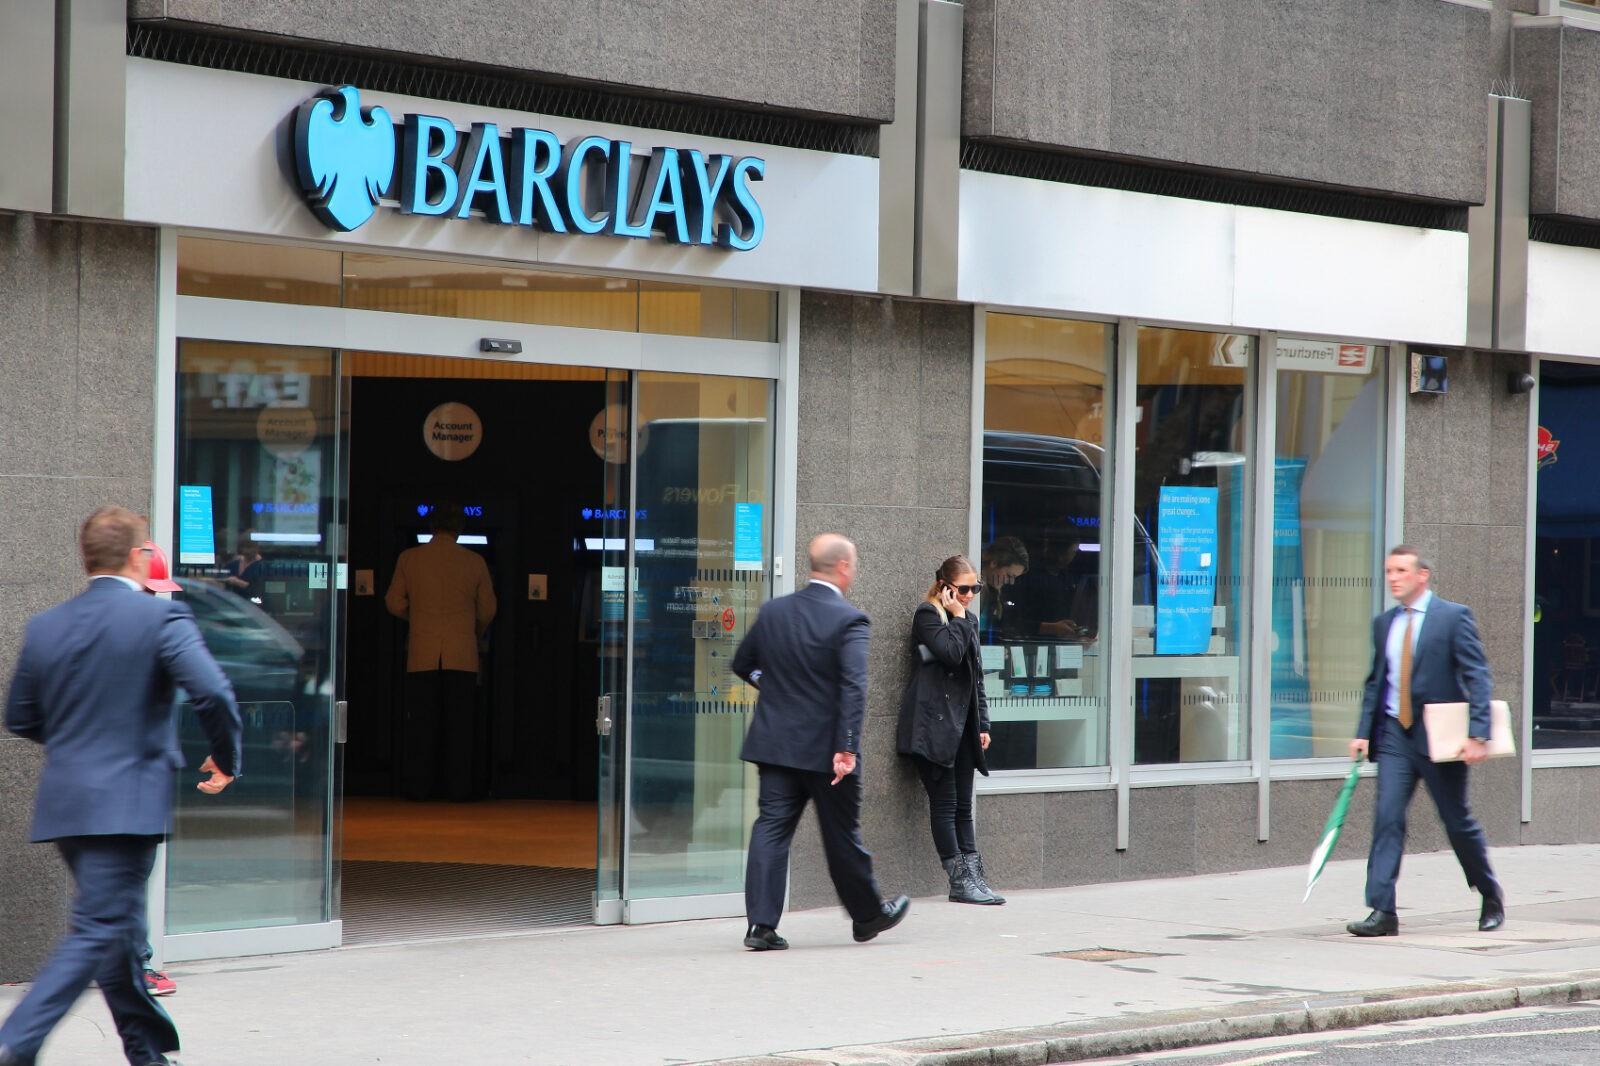 Barclays London